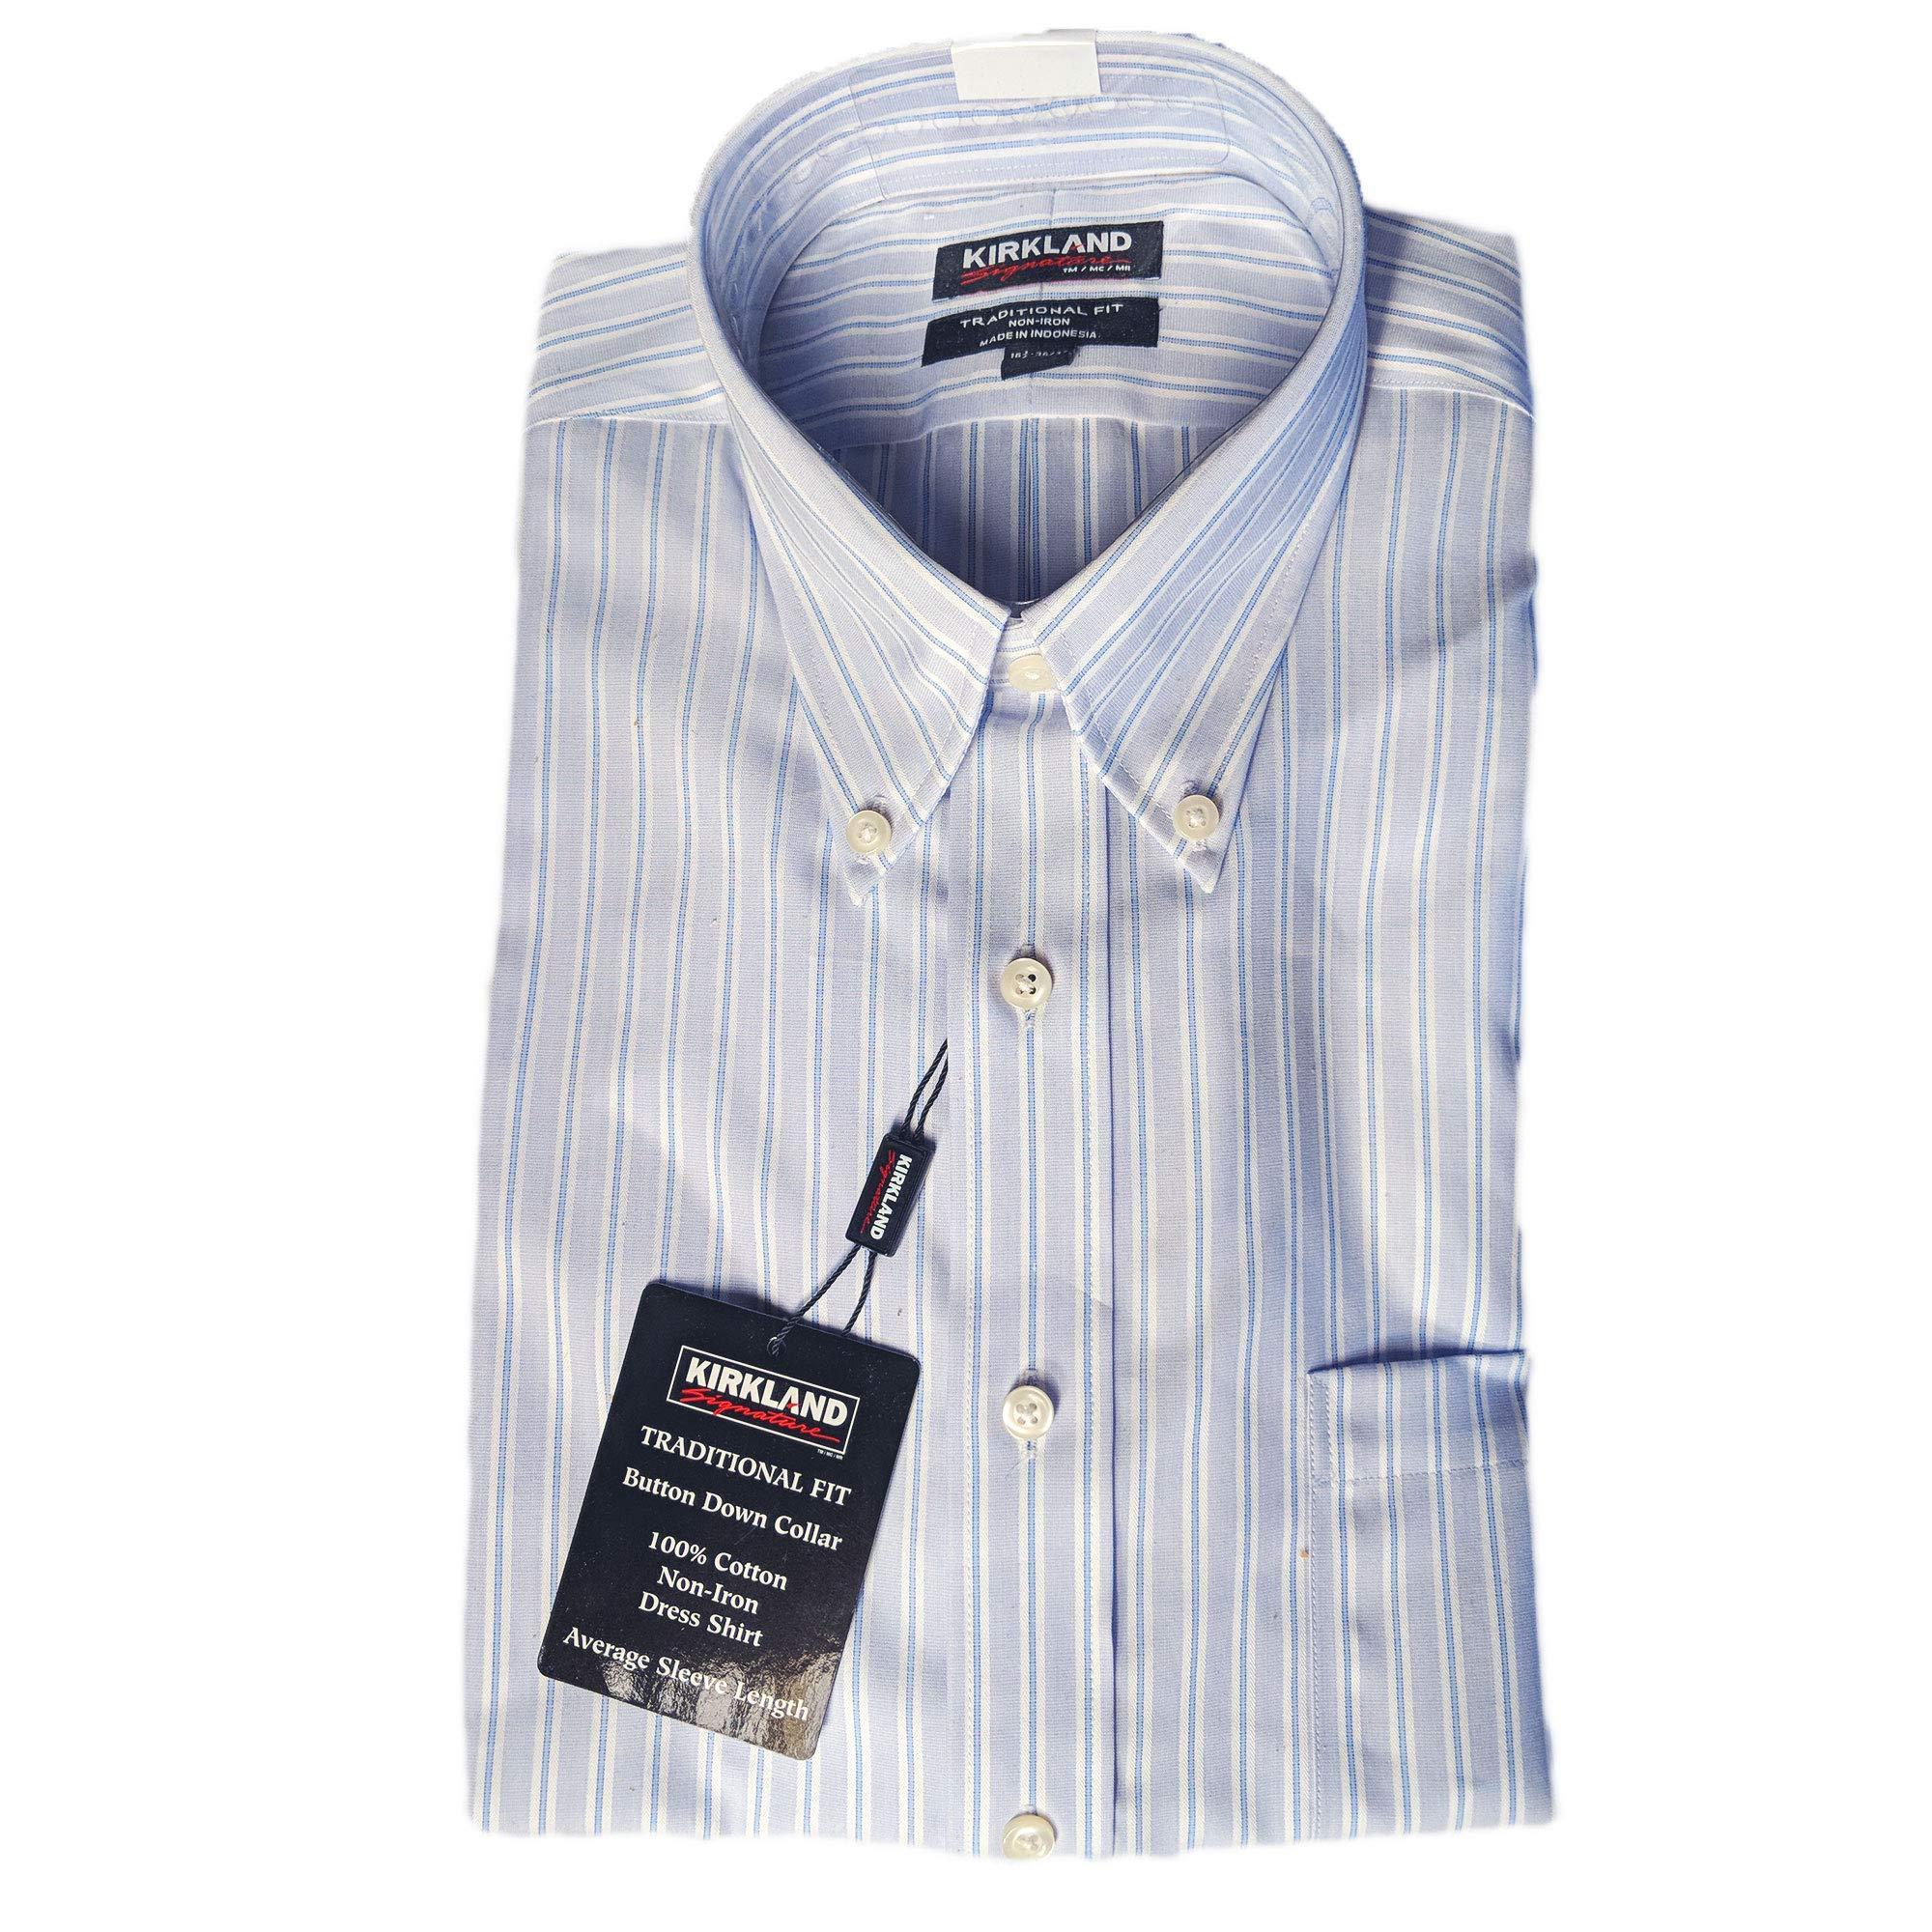 Kirkland Signature Traditional Fit Long Sleeve Dress Shirt Mens Non Iron VARIATY